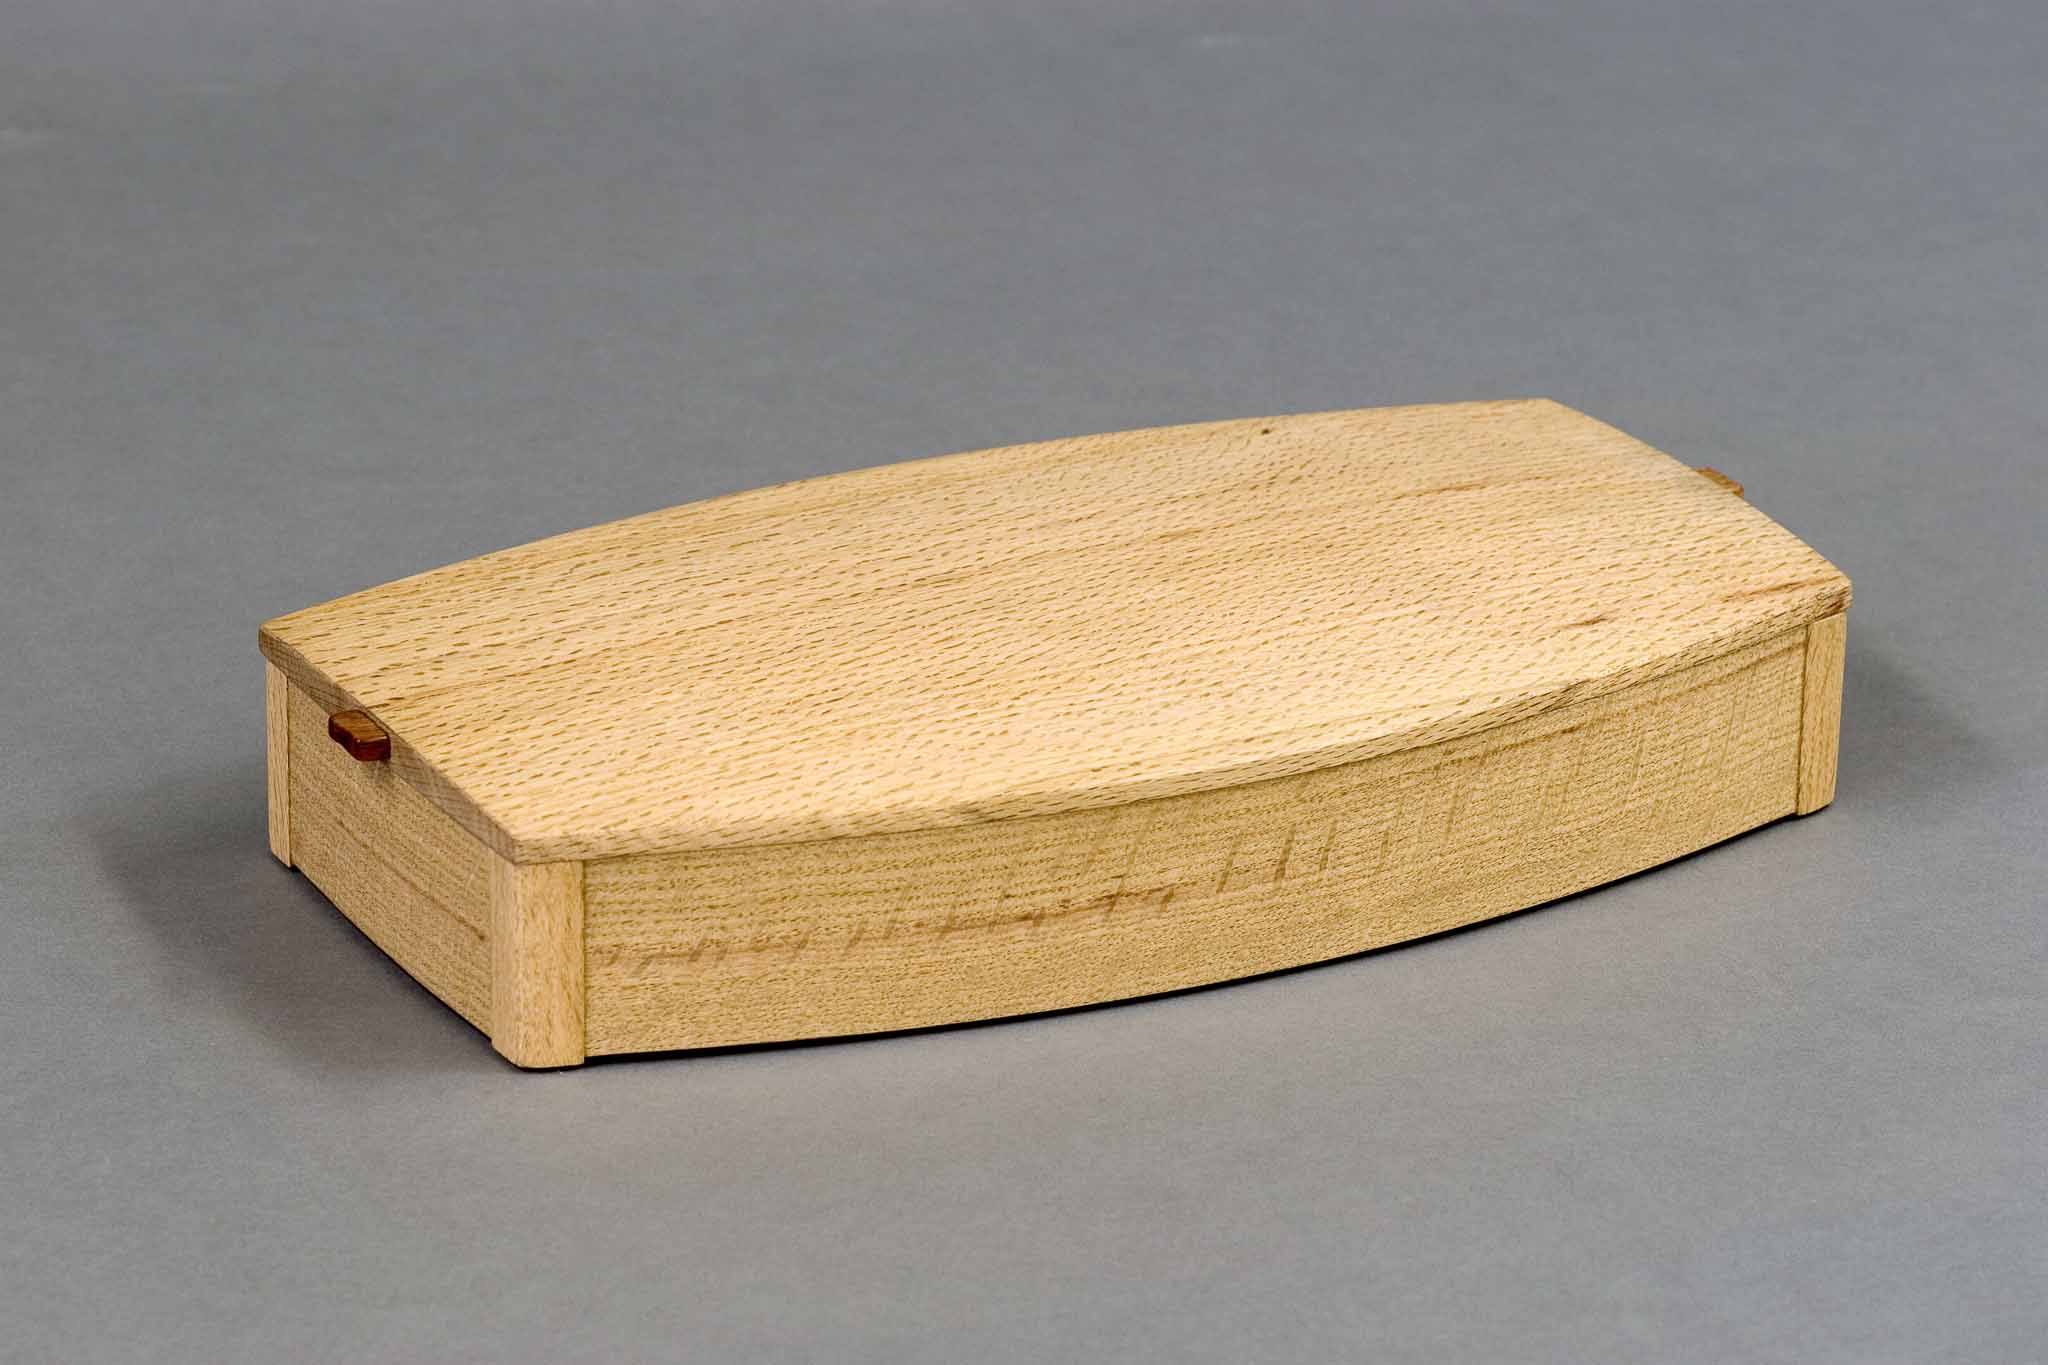 ovoid box